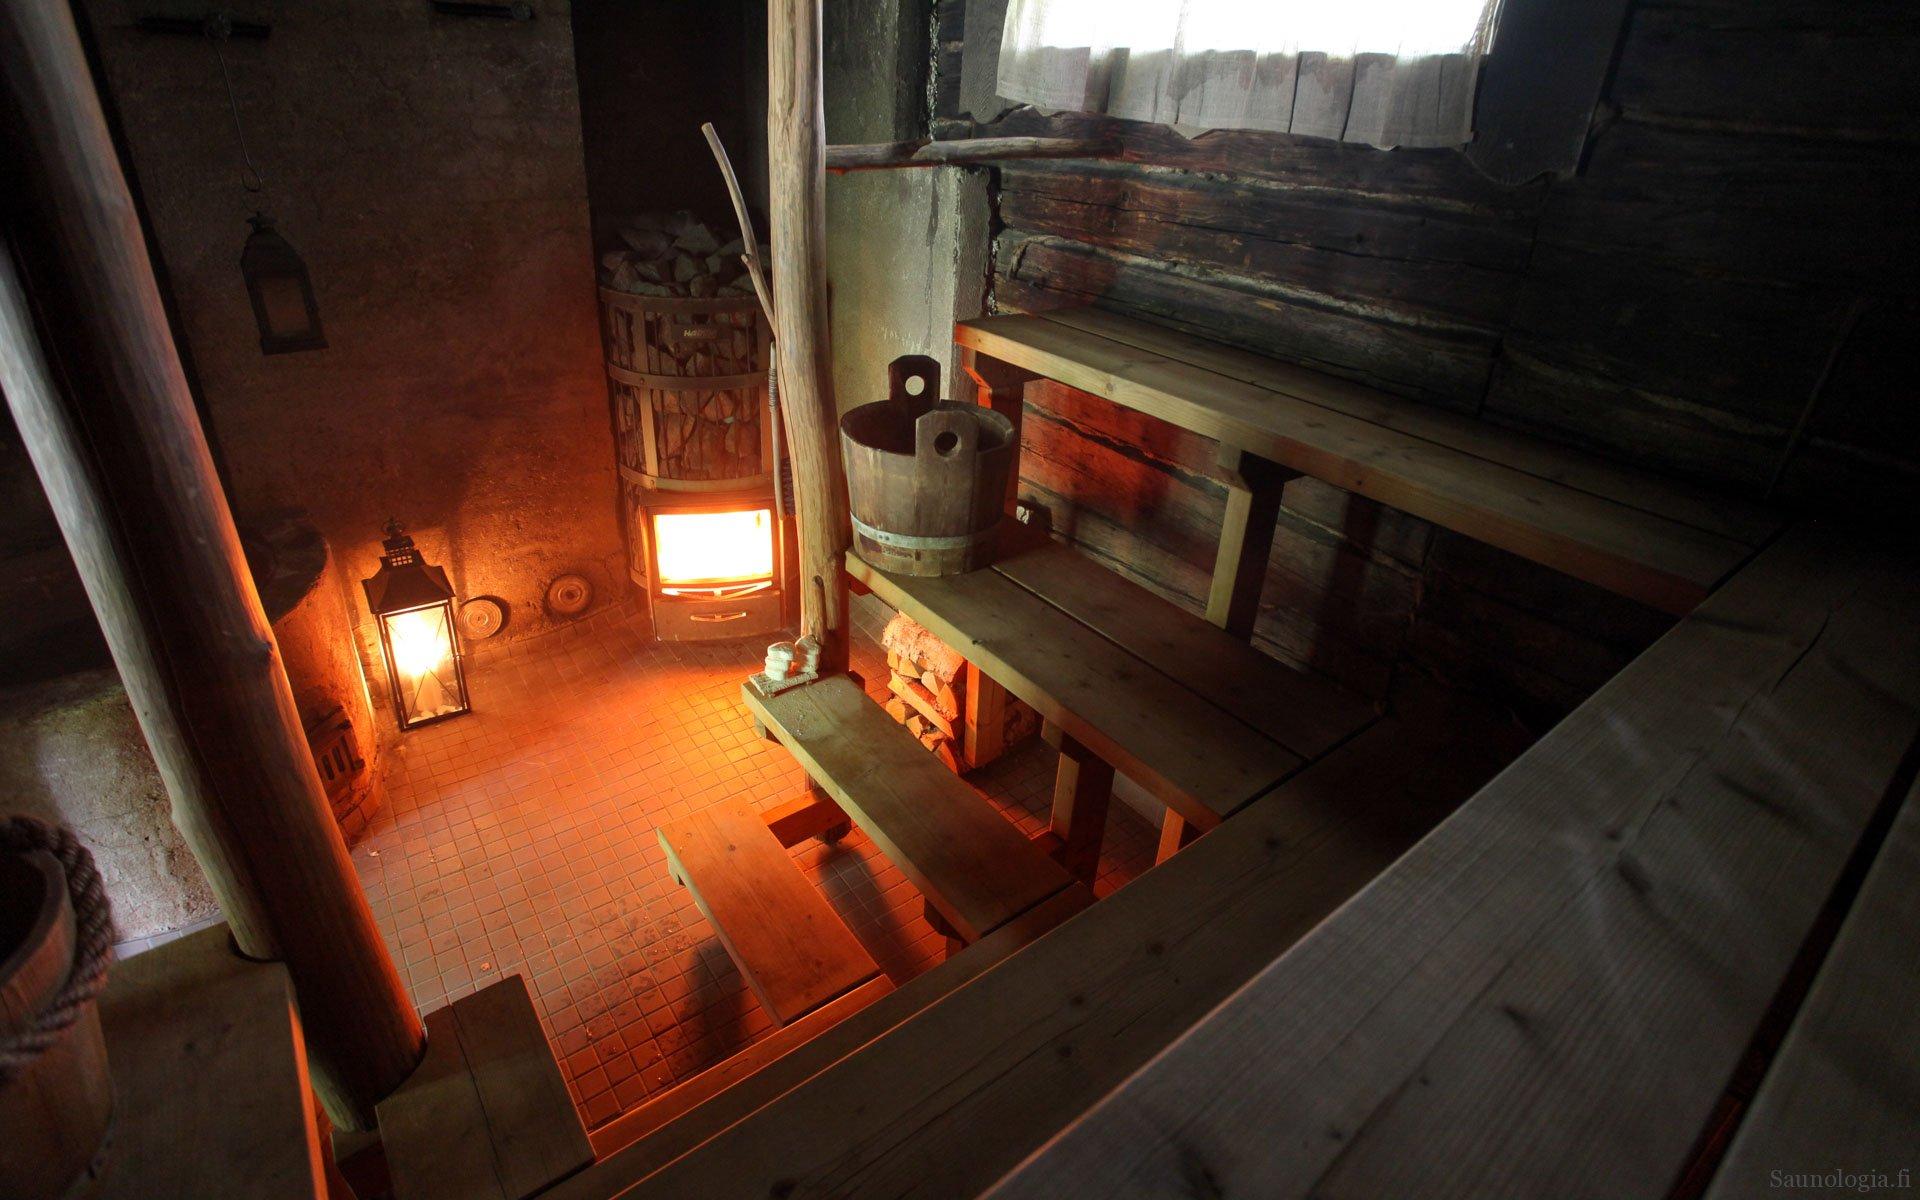 Saunakohdearvio Kaurilan sauna – sauna-aikamatka koko kaupungin pihasaunaan